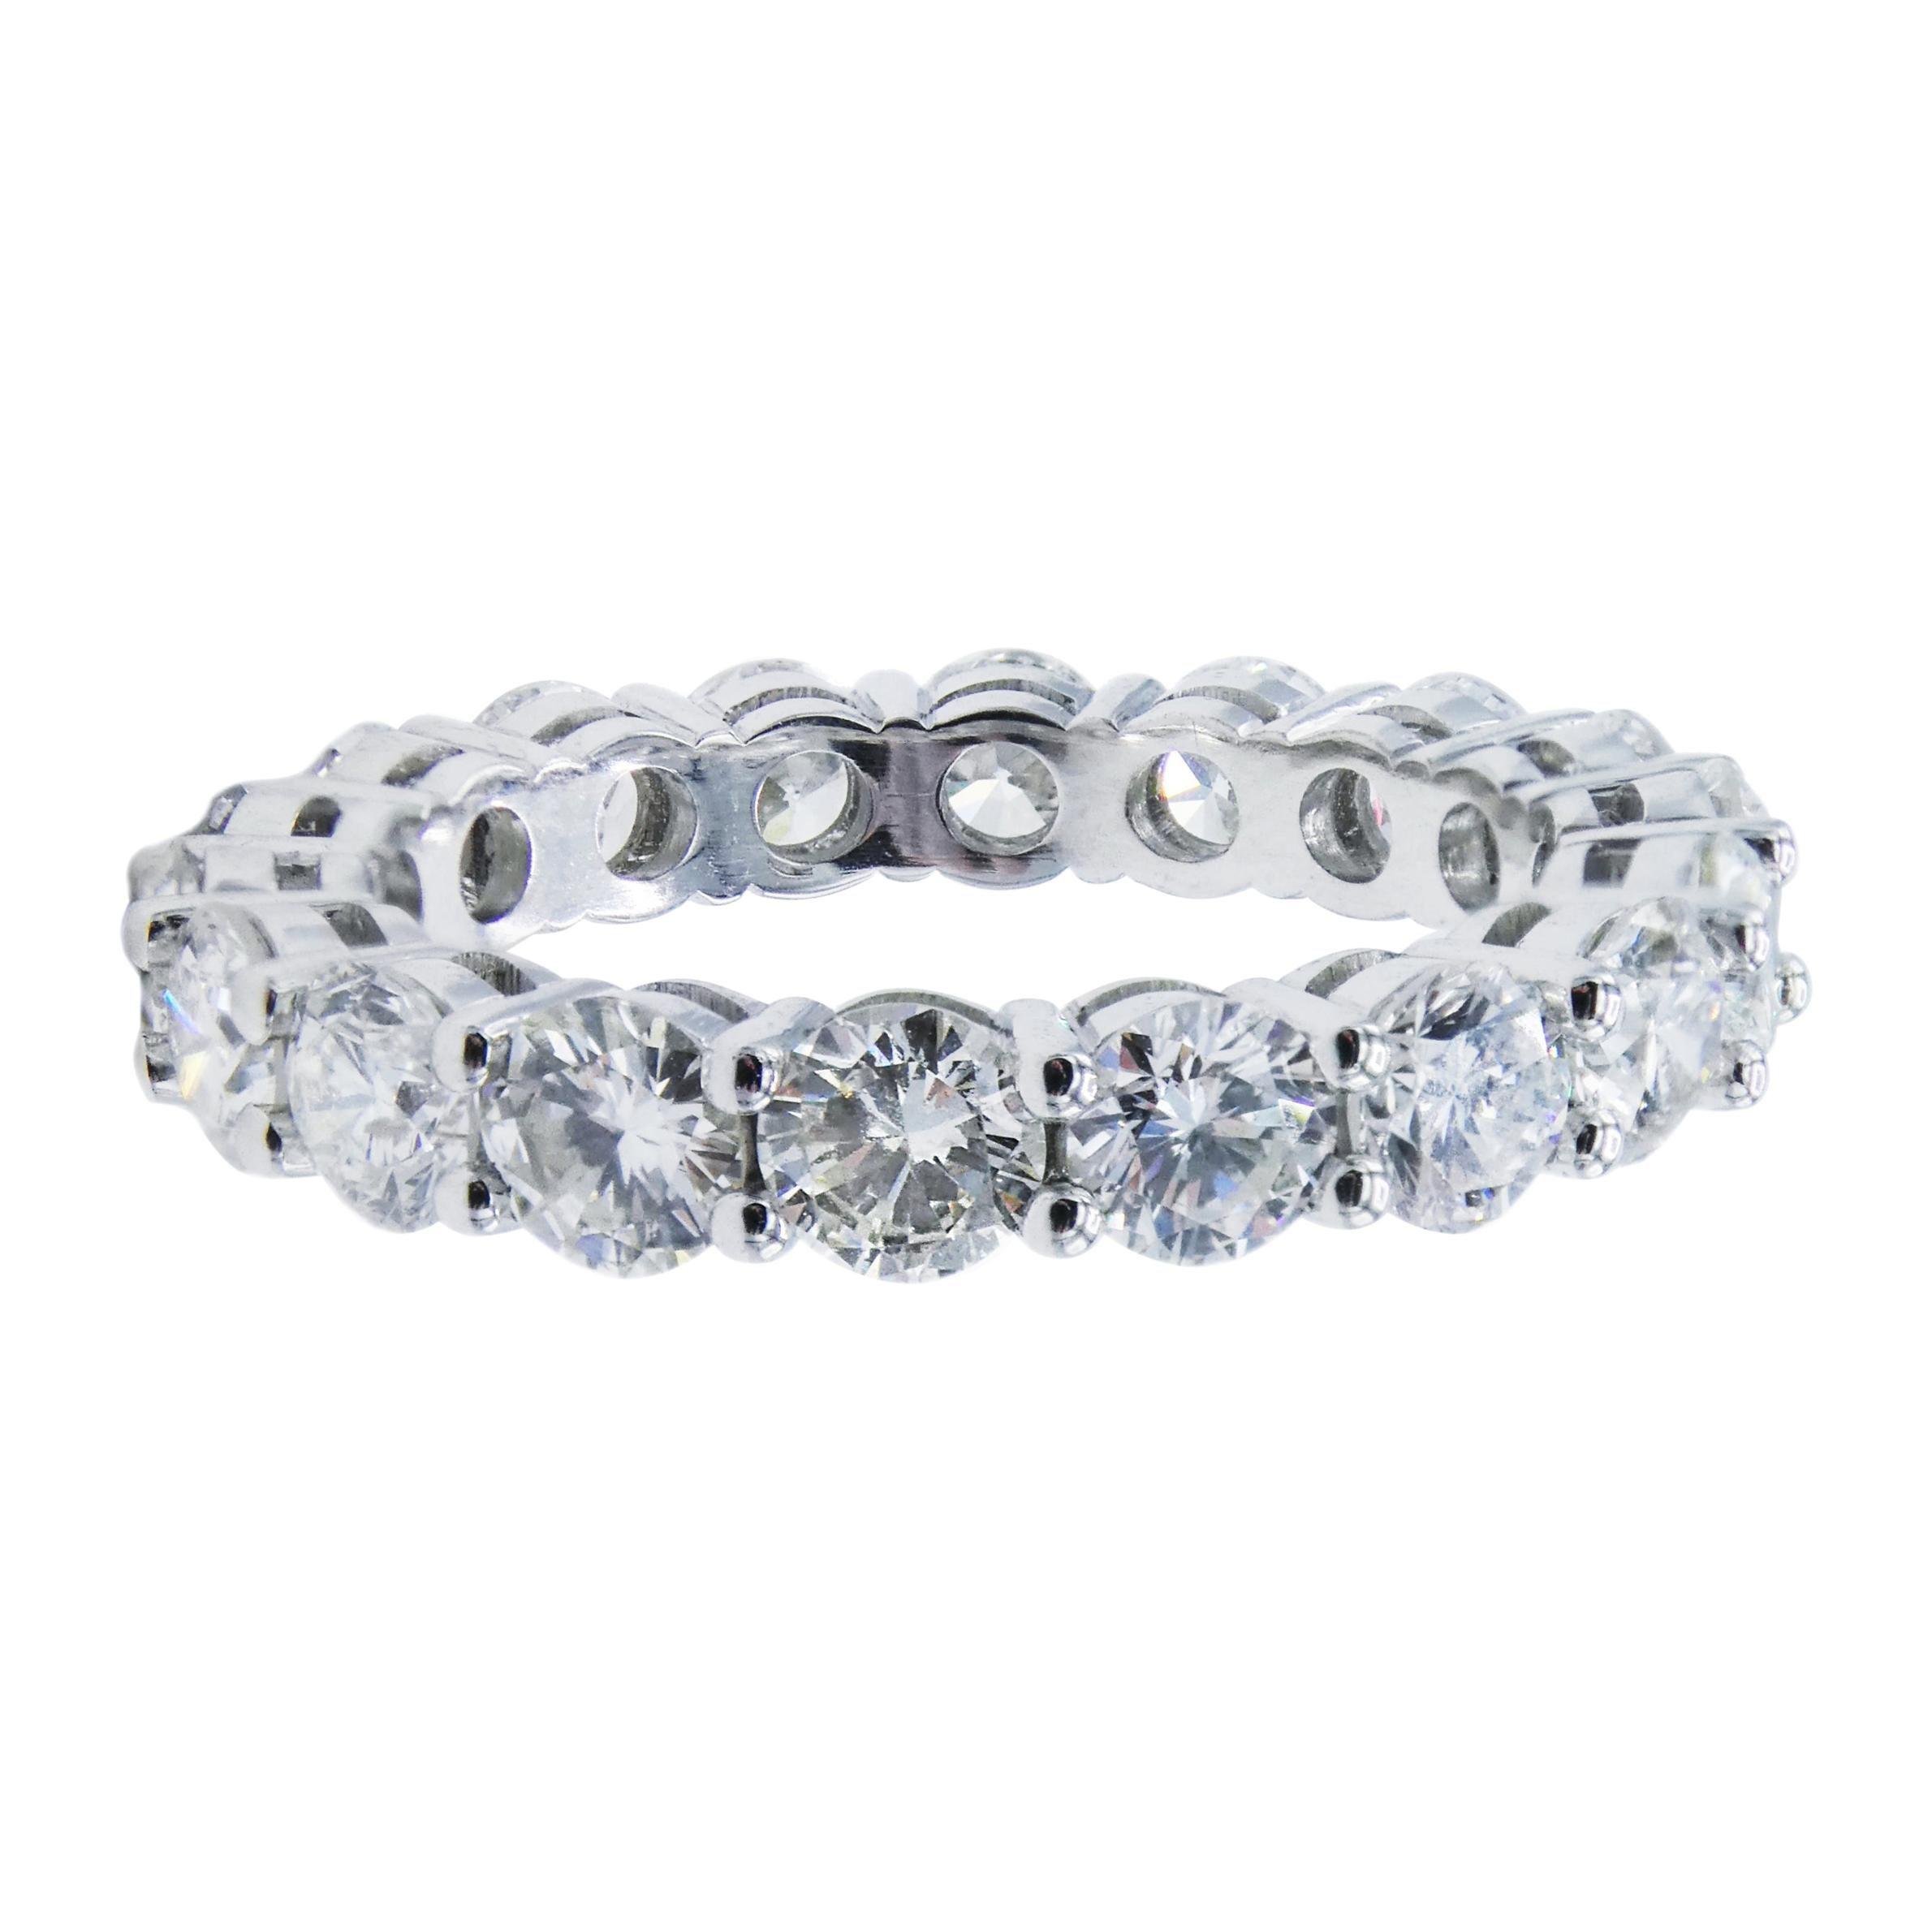 Platinum 3.27 Carat Round Diamond Eternity Band Ring